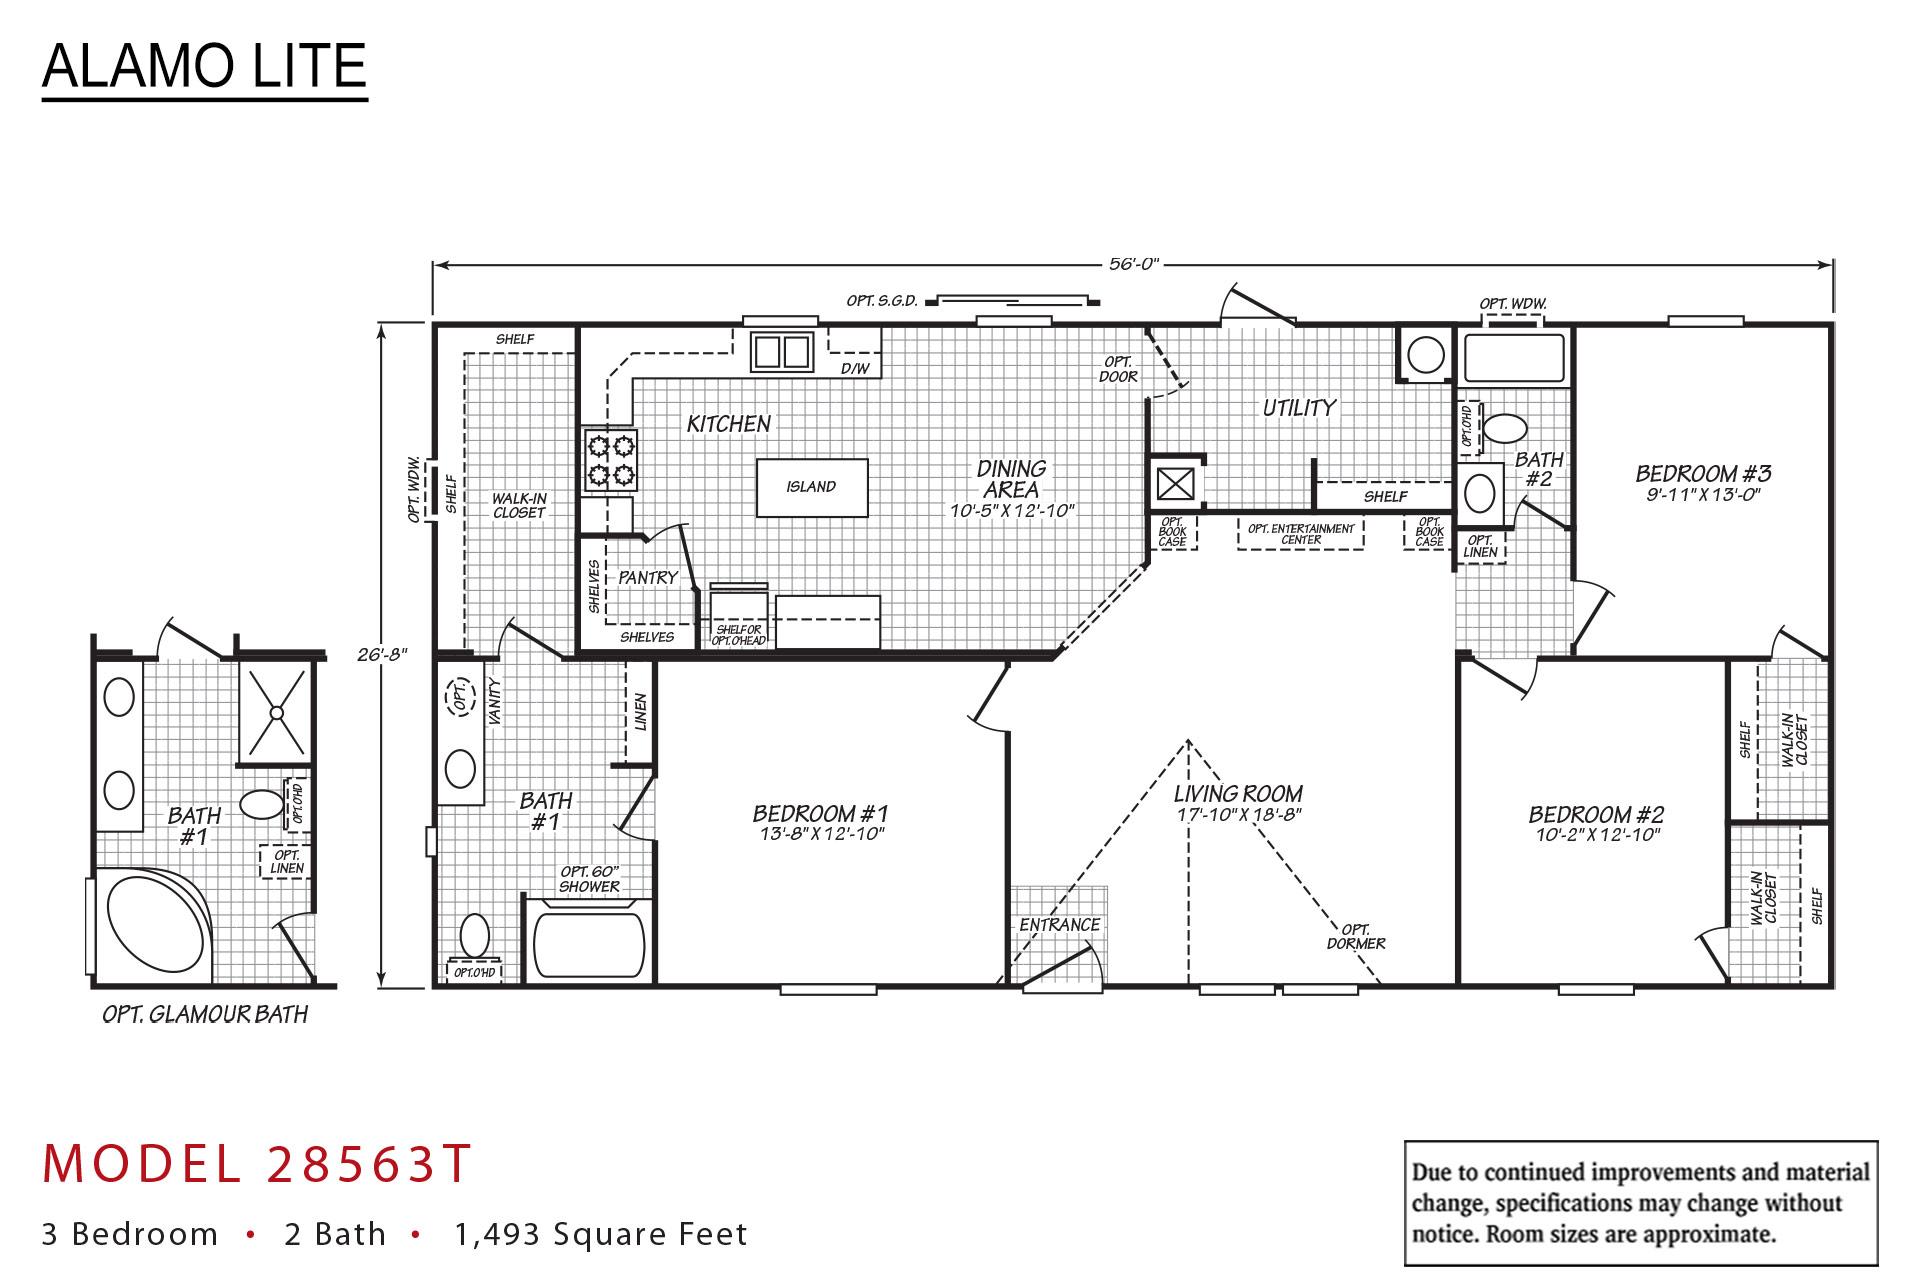 Alamo Lite Multi-Section - AL-28563T